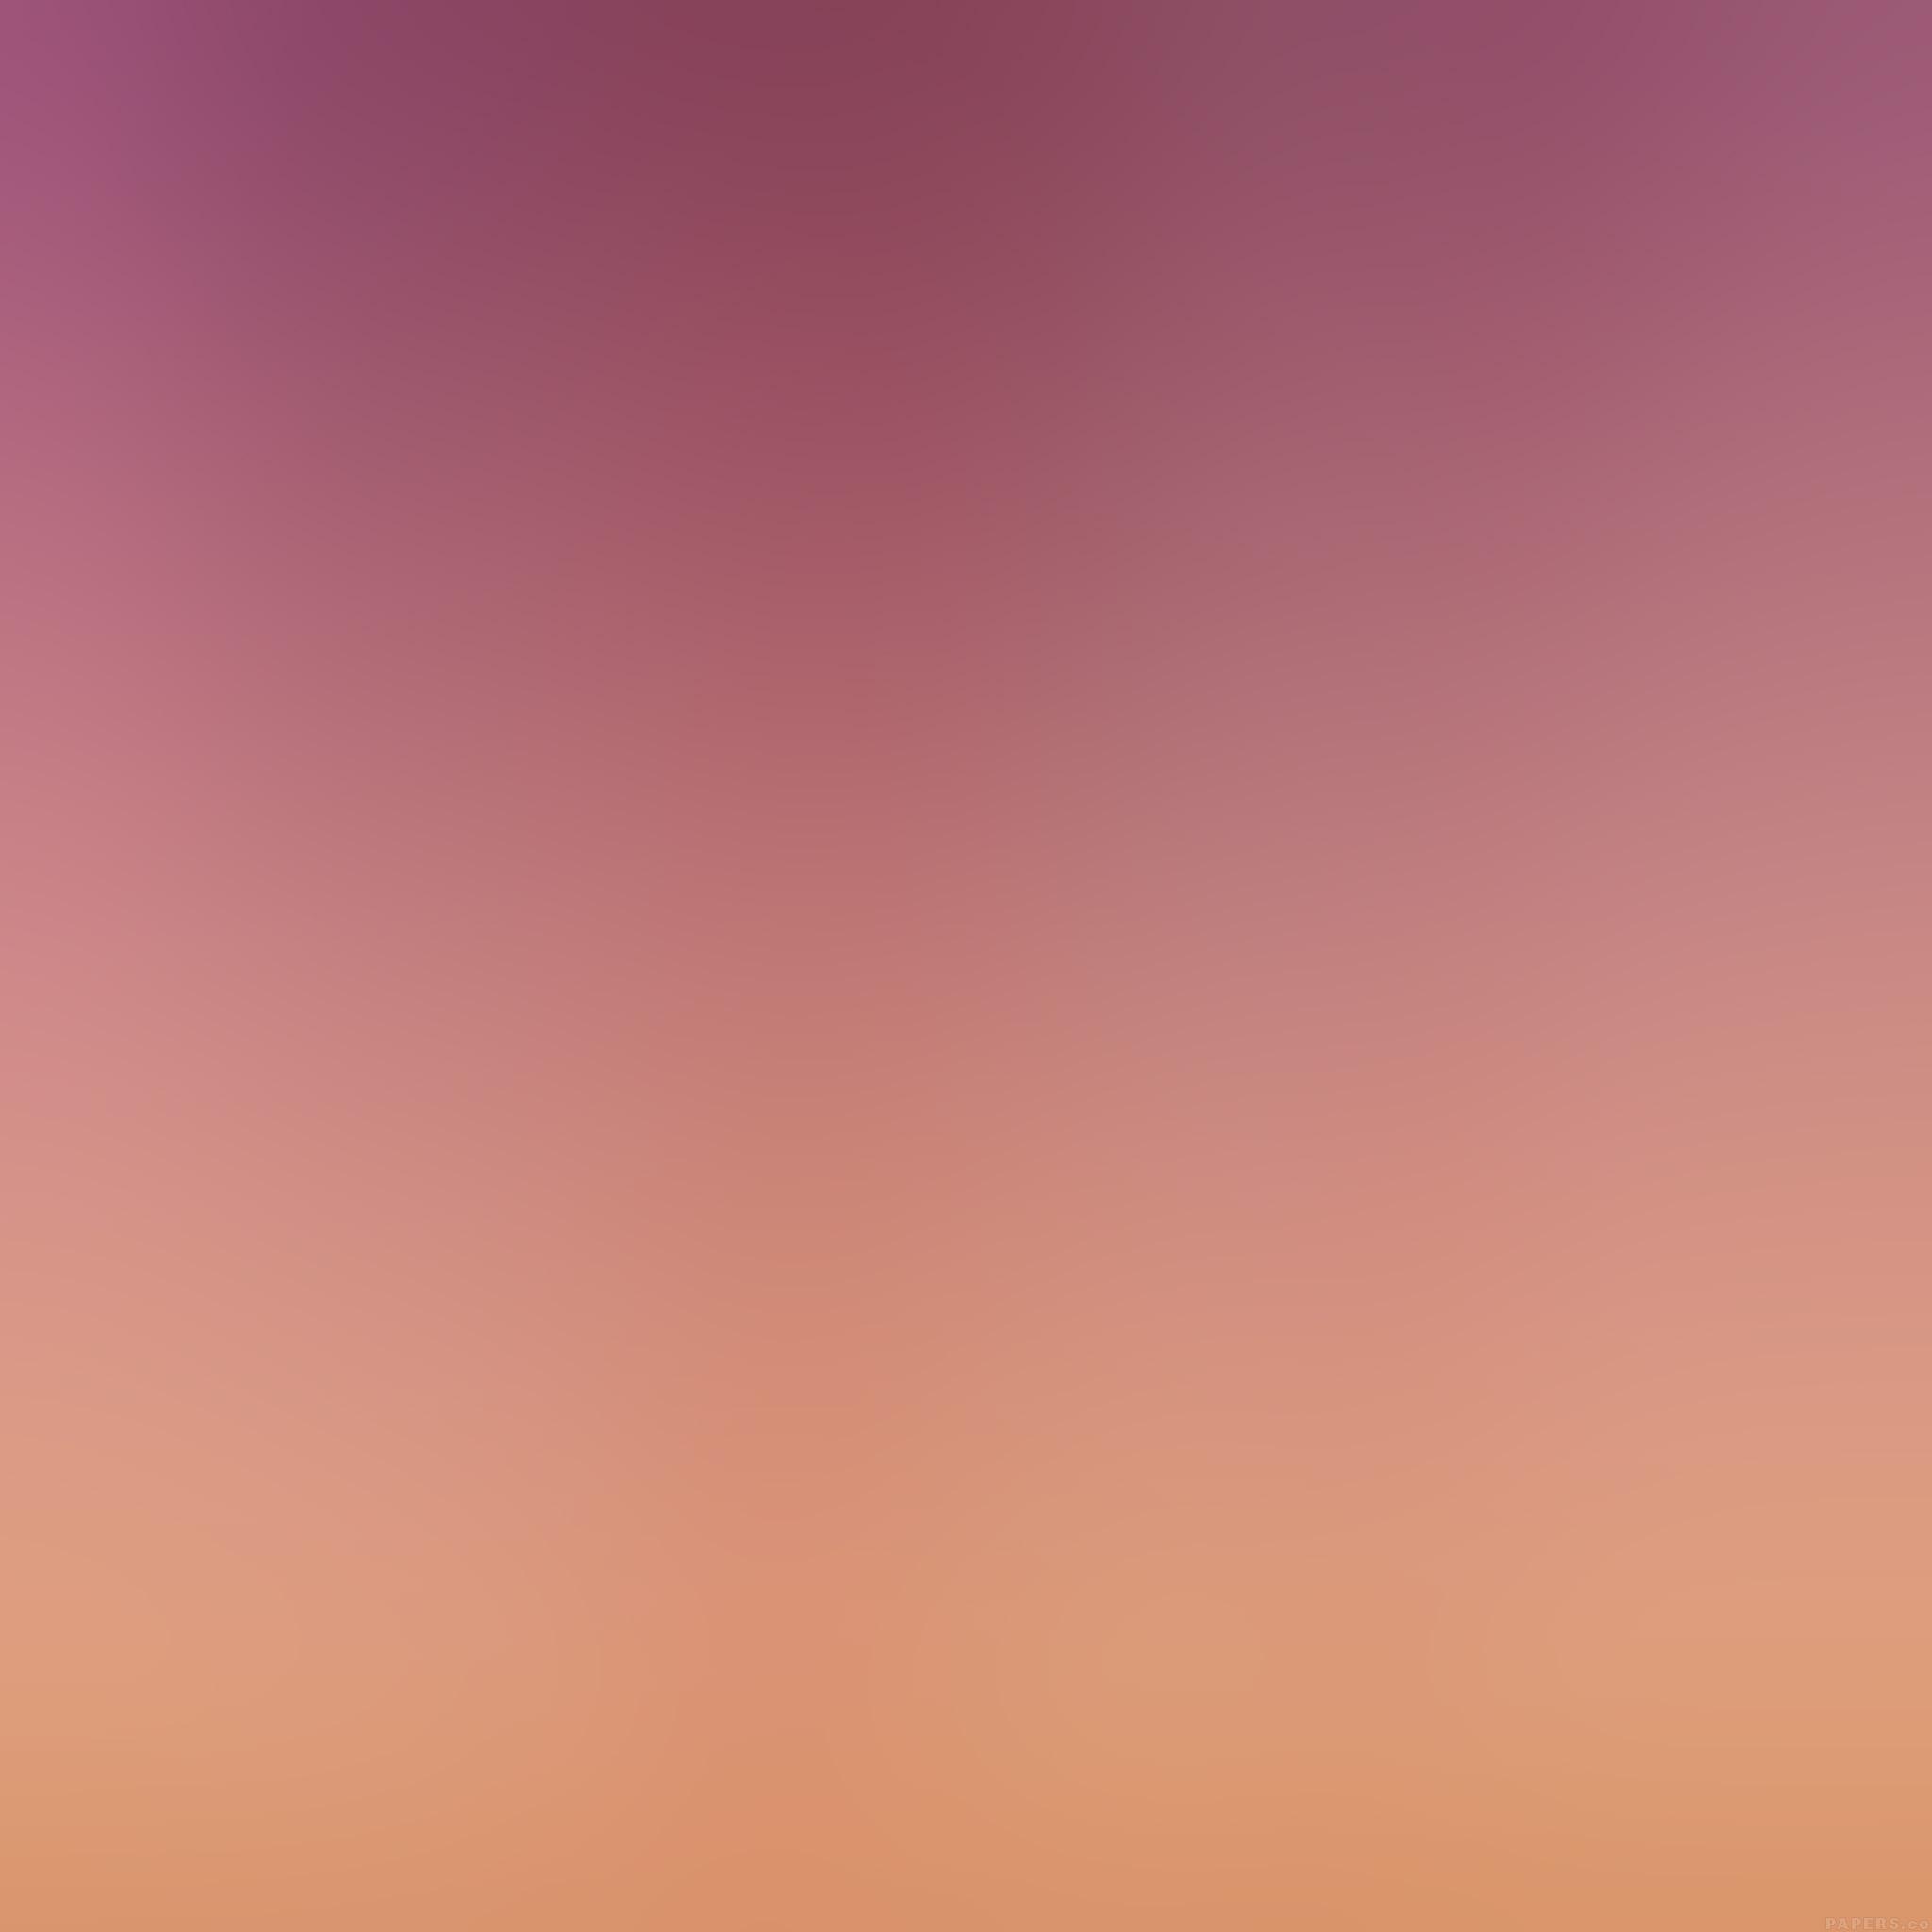 Iphone wallpaper blur - Freeios7 Sd48 Soft Love Relationship Gradation Blur